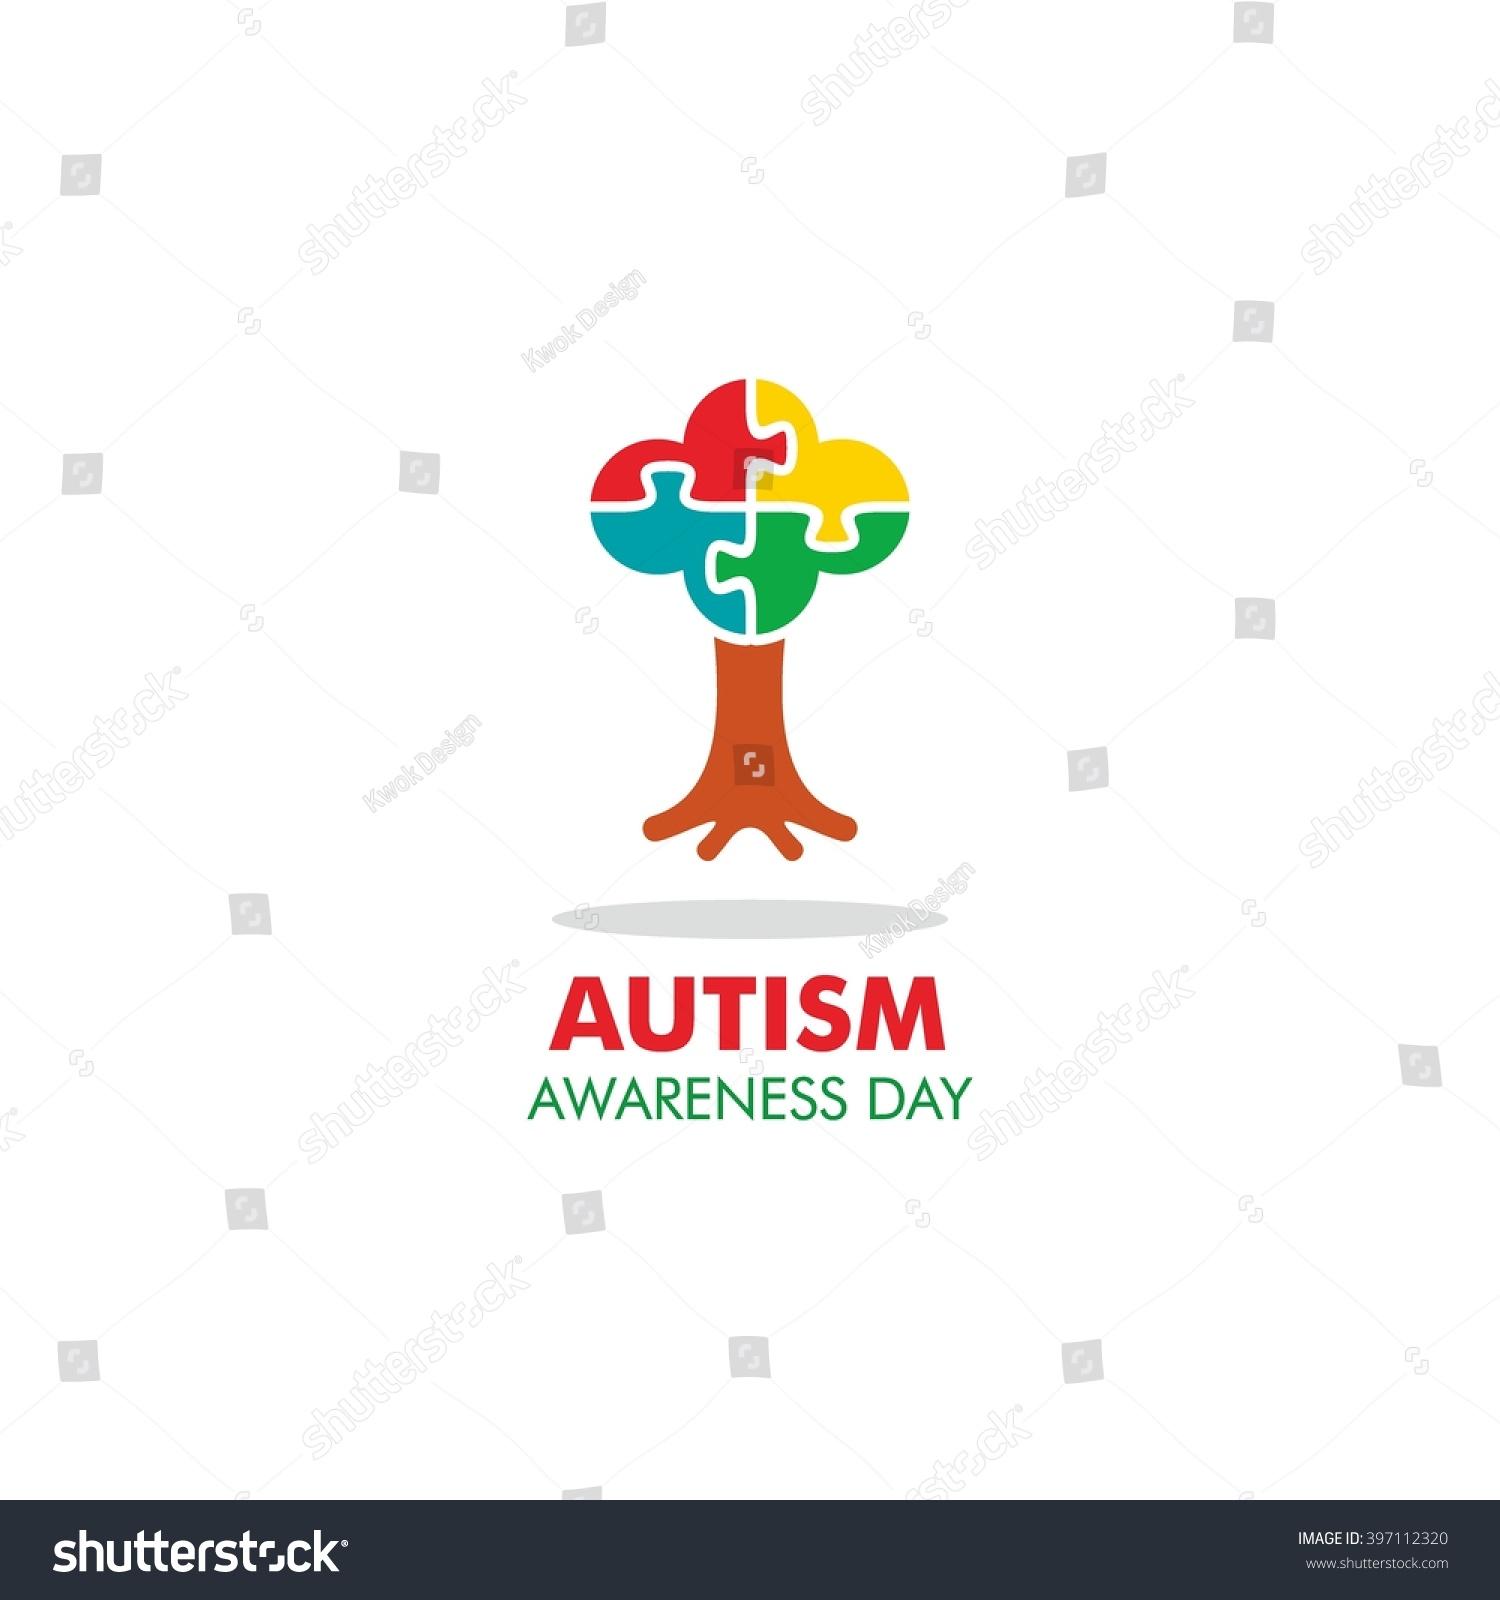 World autism awareness day logo design stock vector 397112320 world autism awareness day logo design template vector illustration colorful puzzles symbol biocorpaavc